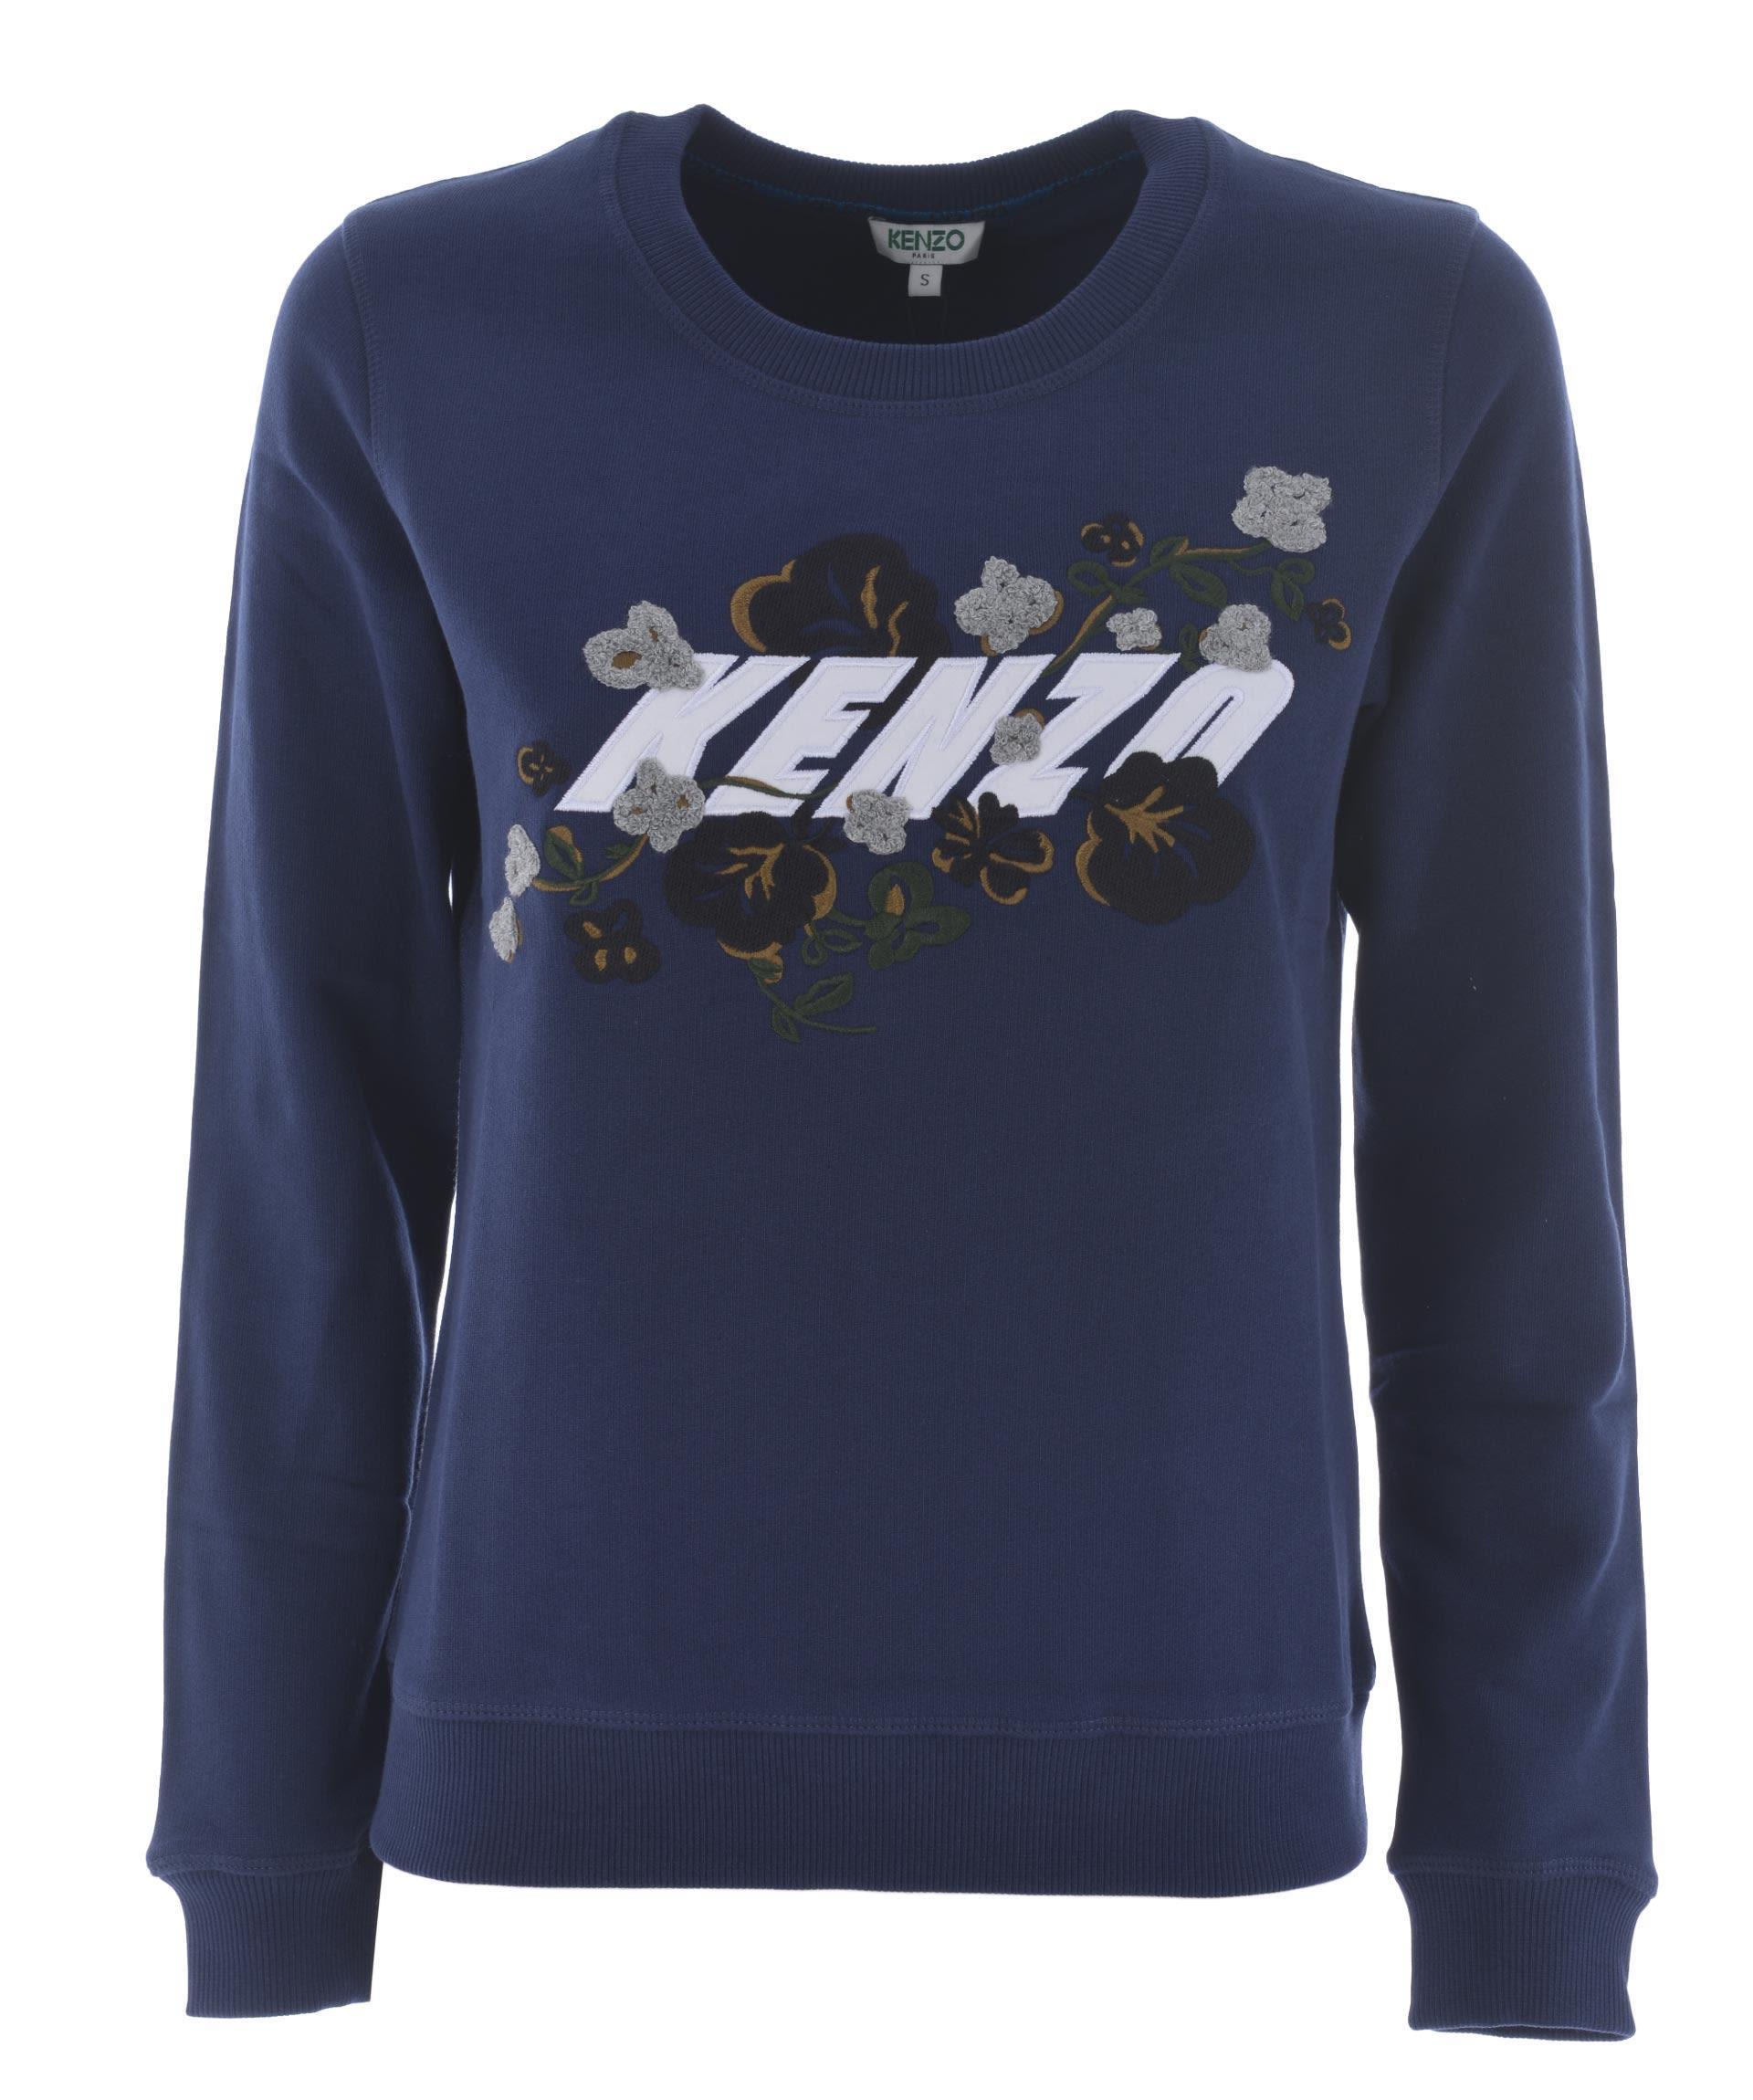 Kenzo X Floral Leaf Sweatshirt In Blu